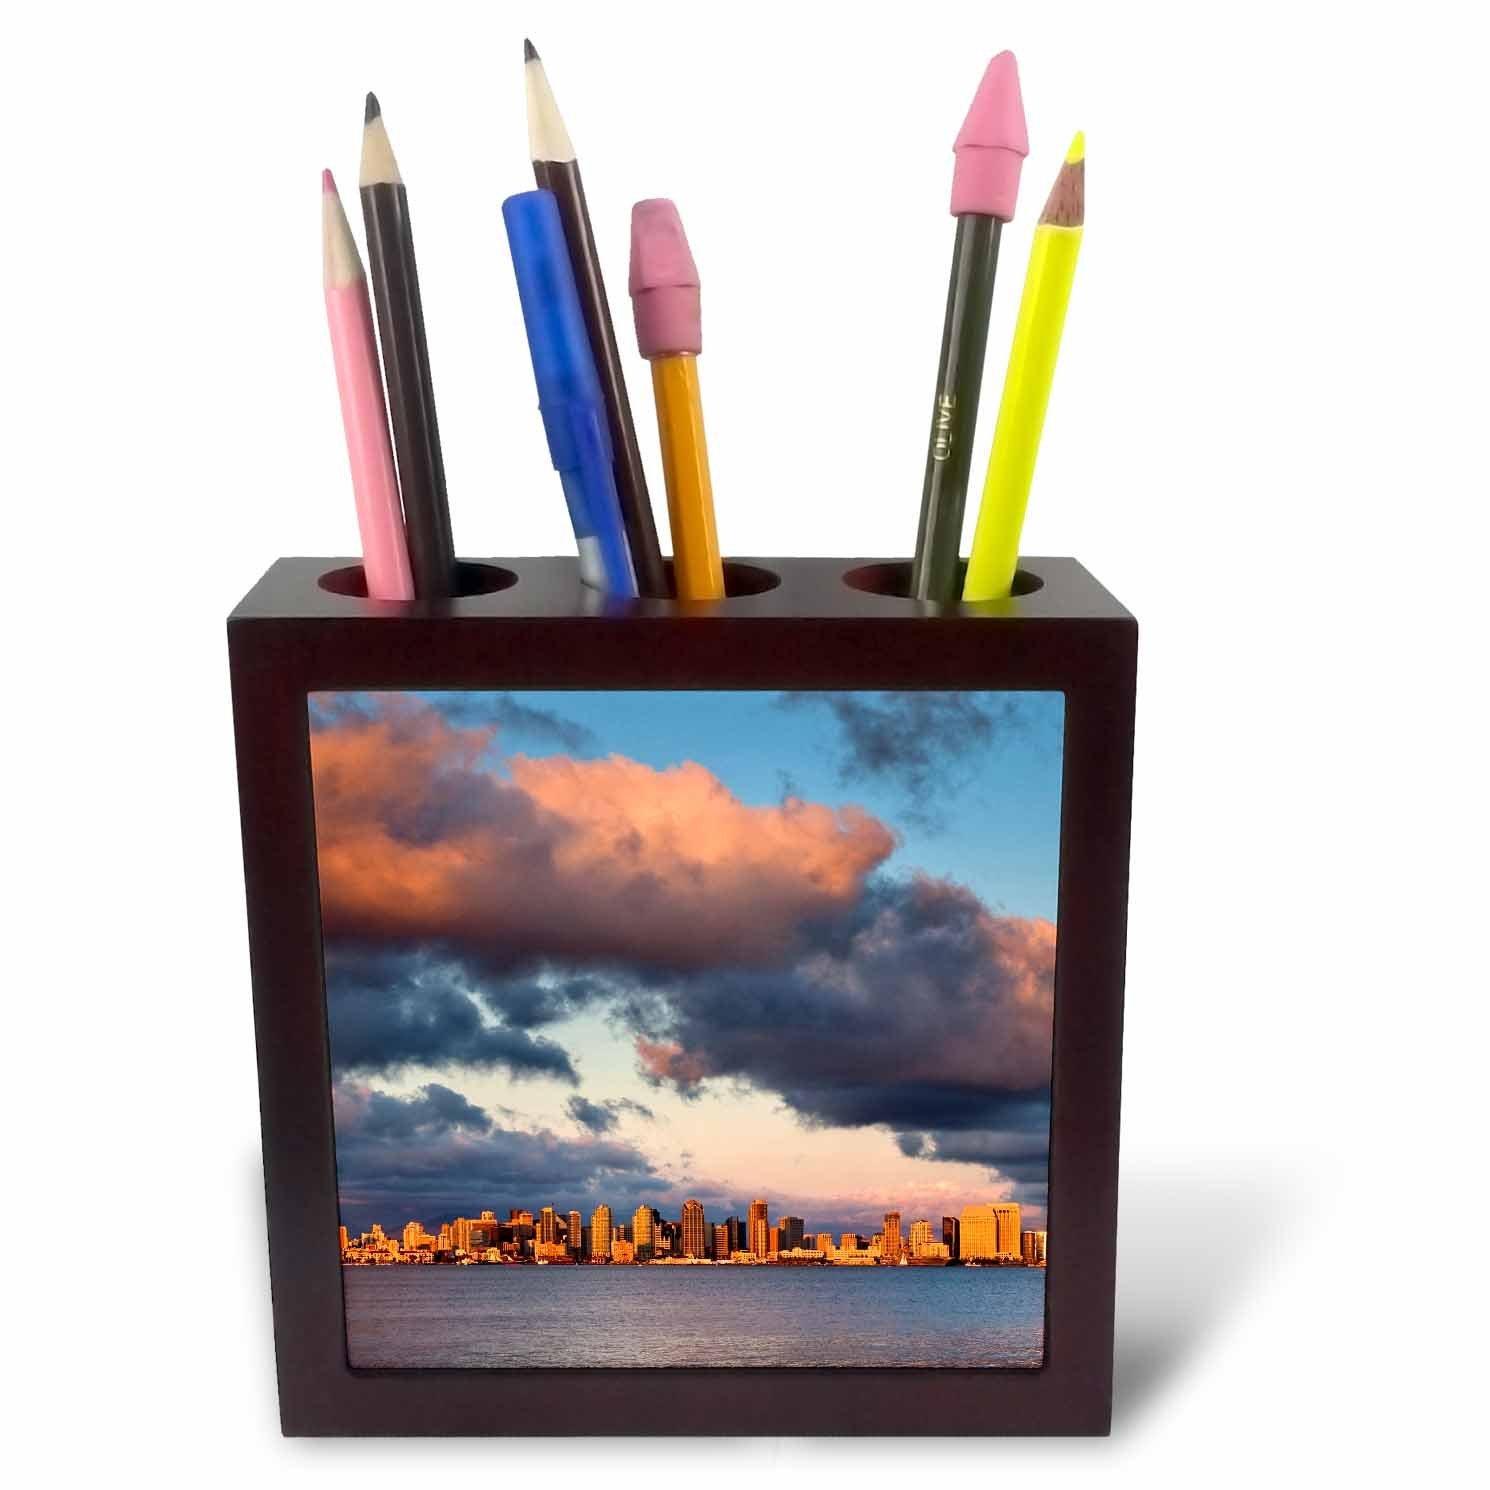 3dRose Danita Delimont - San Diego - California, San Diego, City skyline across San Diego Bay - 5 inch tile pen holder (ph_250630_1)